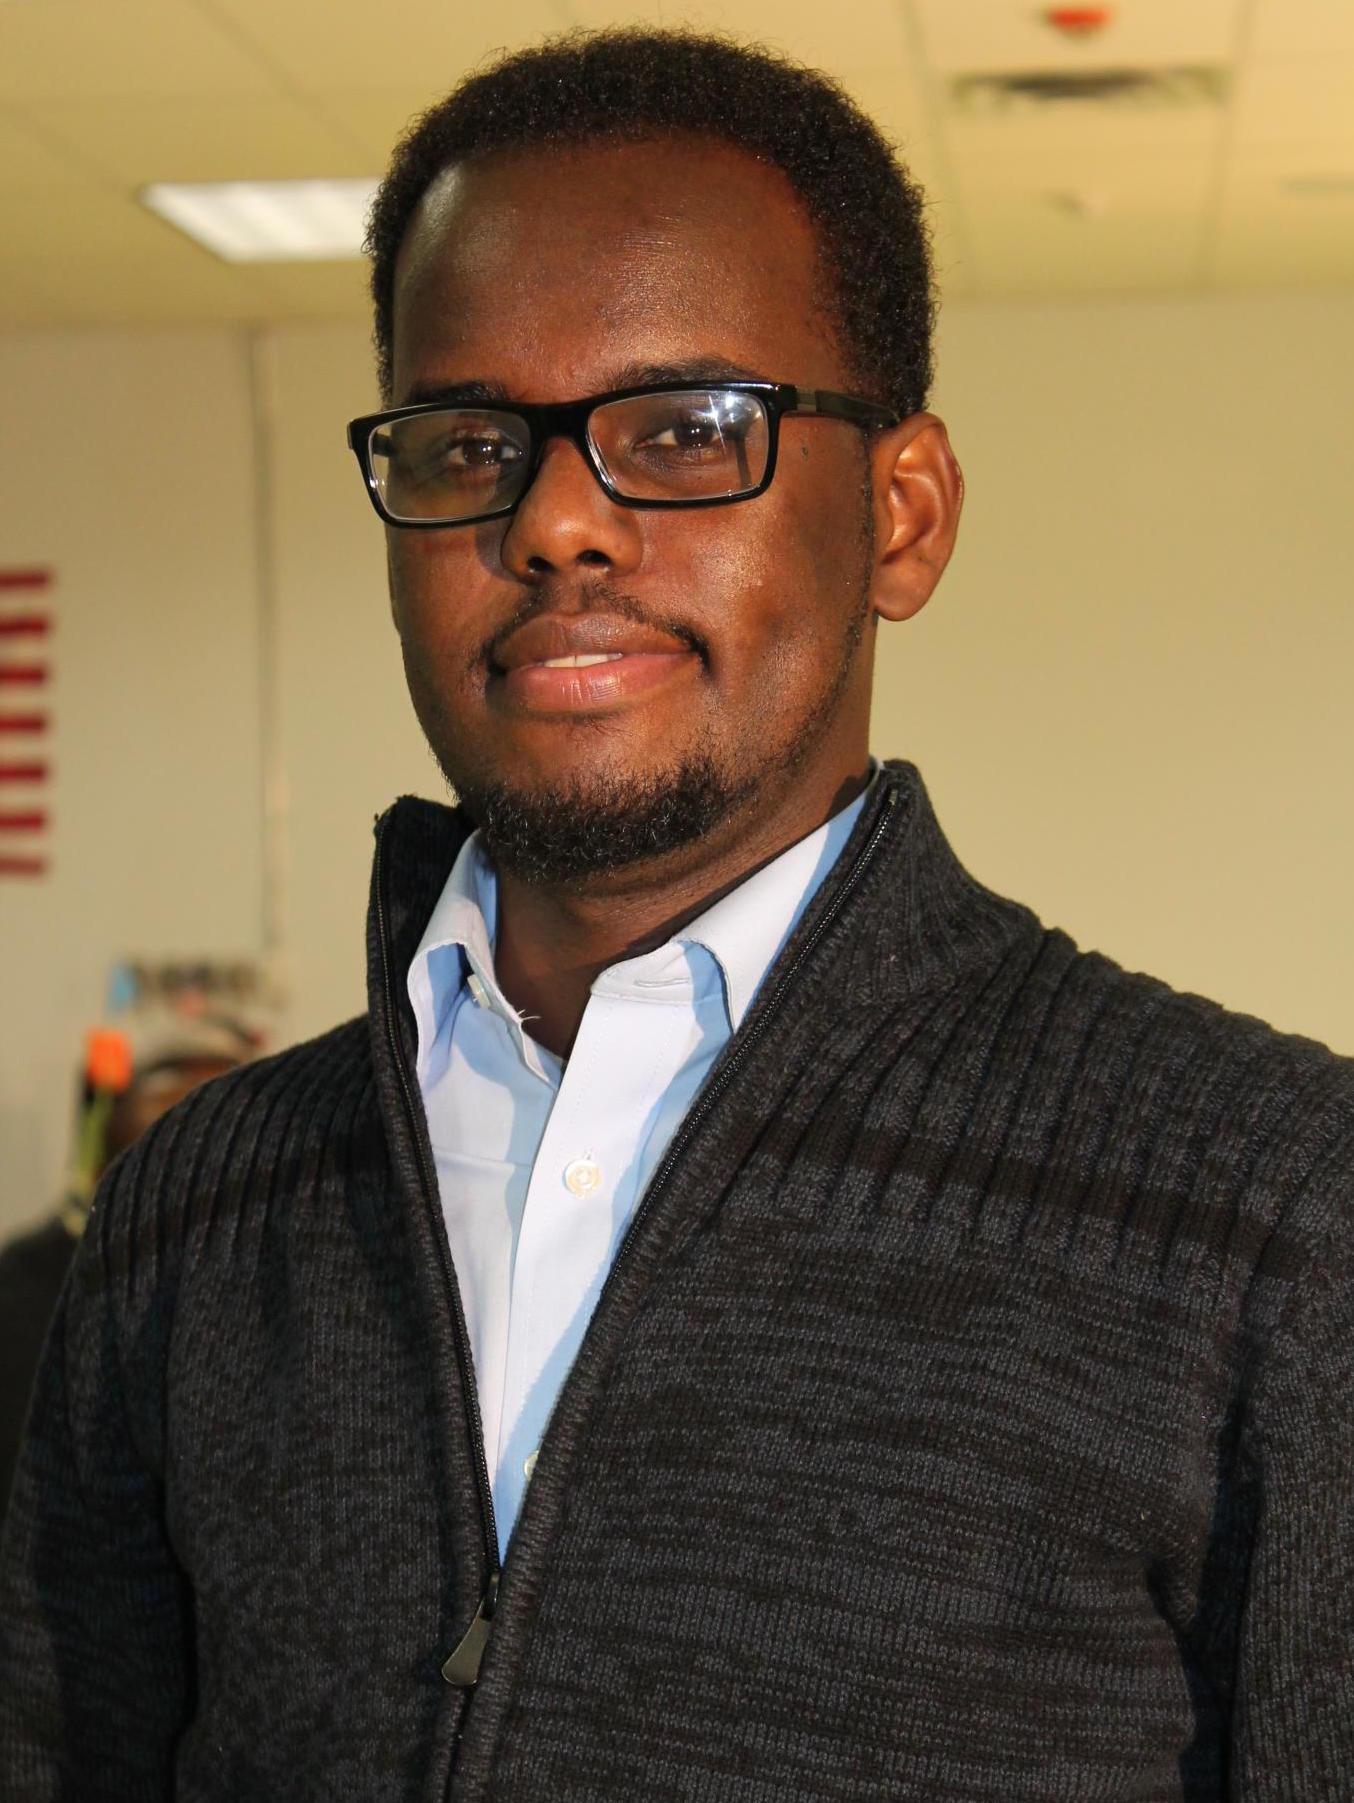 Ibrahim Hirsi